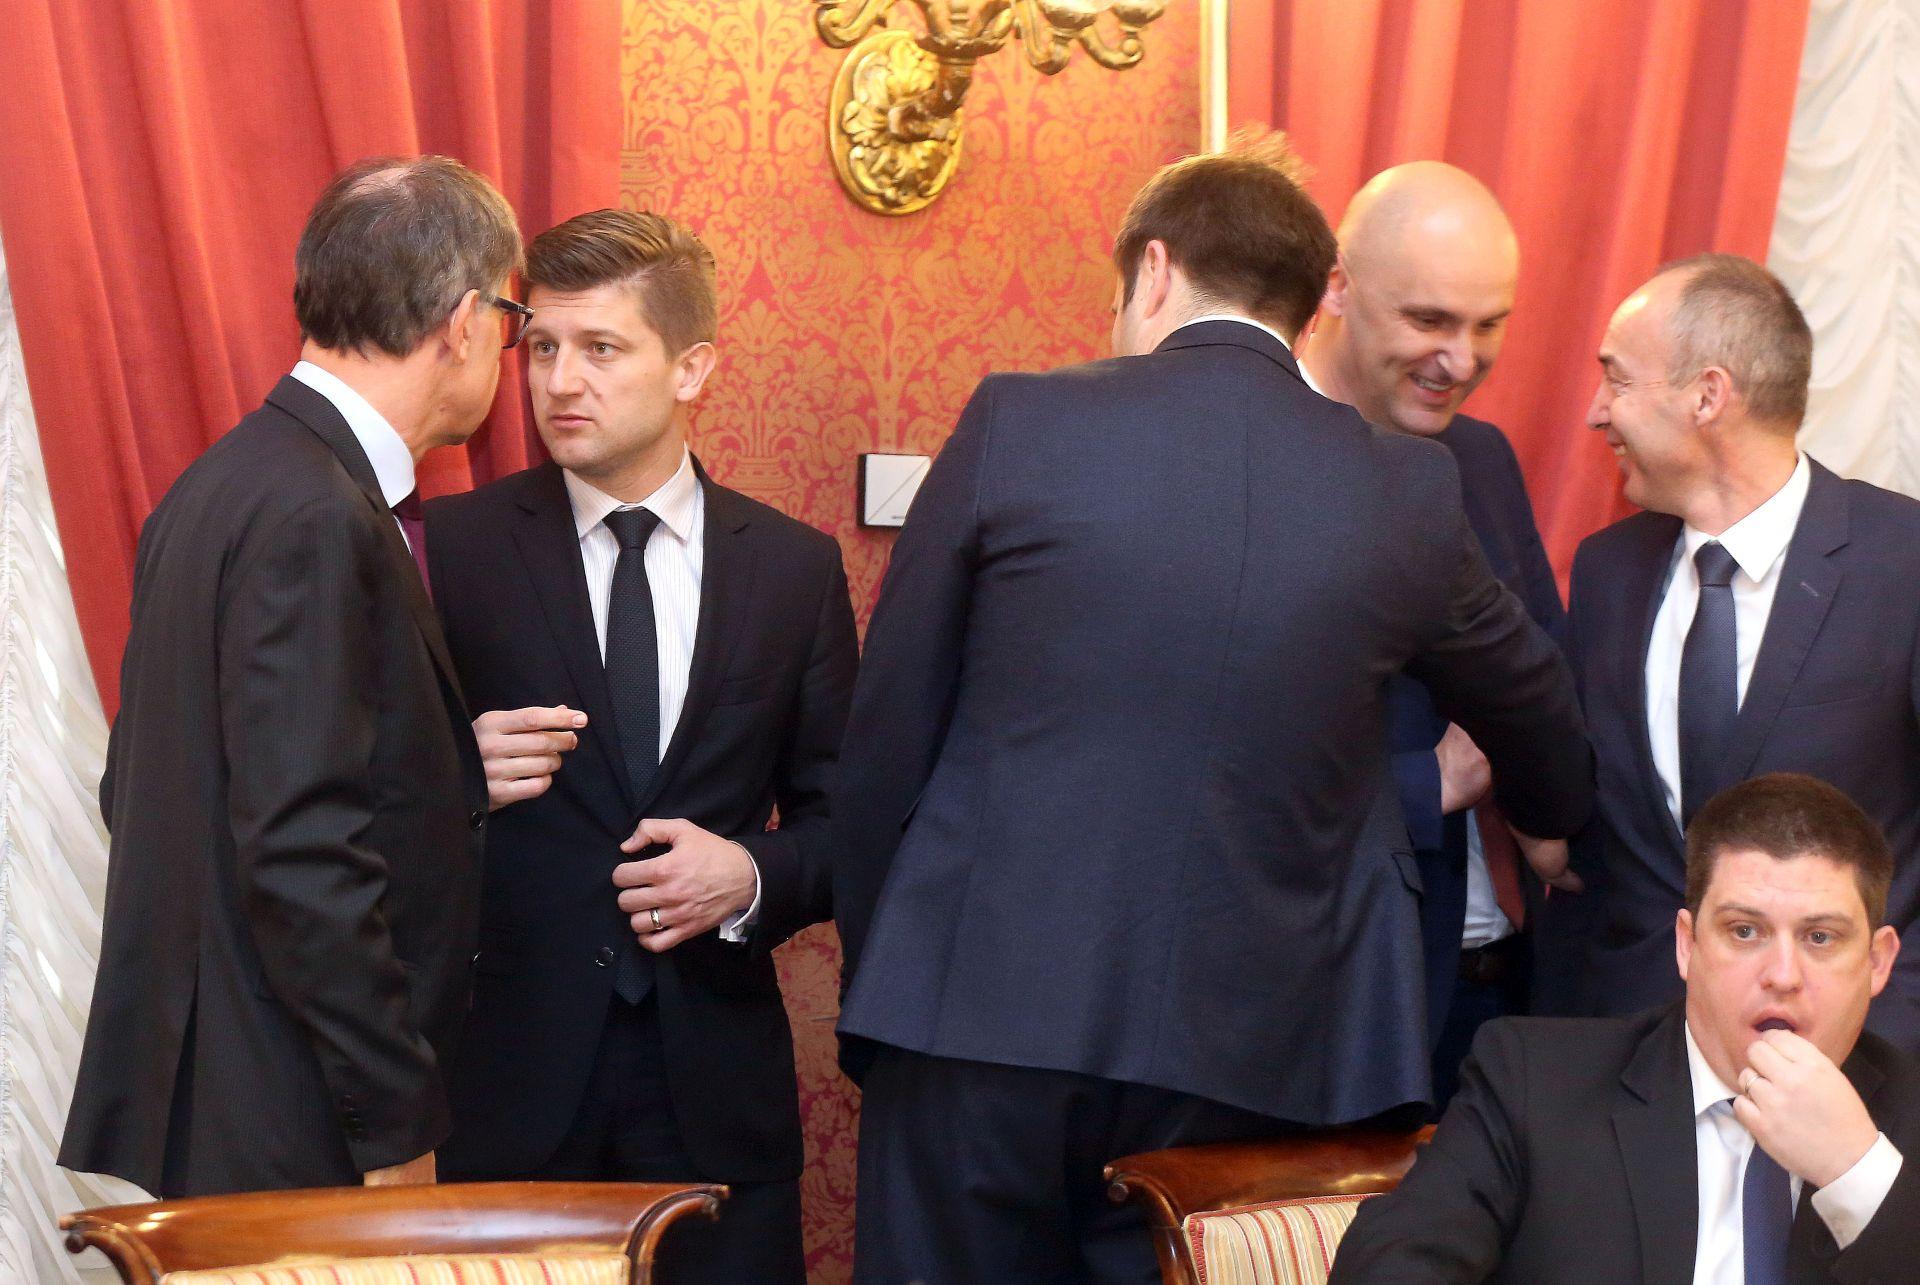 MINISTAR FINANCIJA: Hrvatska ima političku stabilnost potrebnu za provedbu reformi